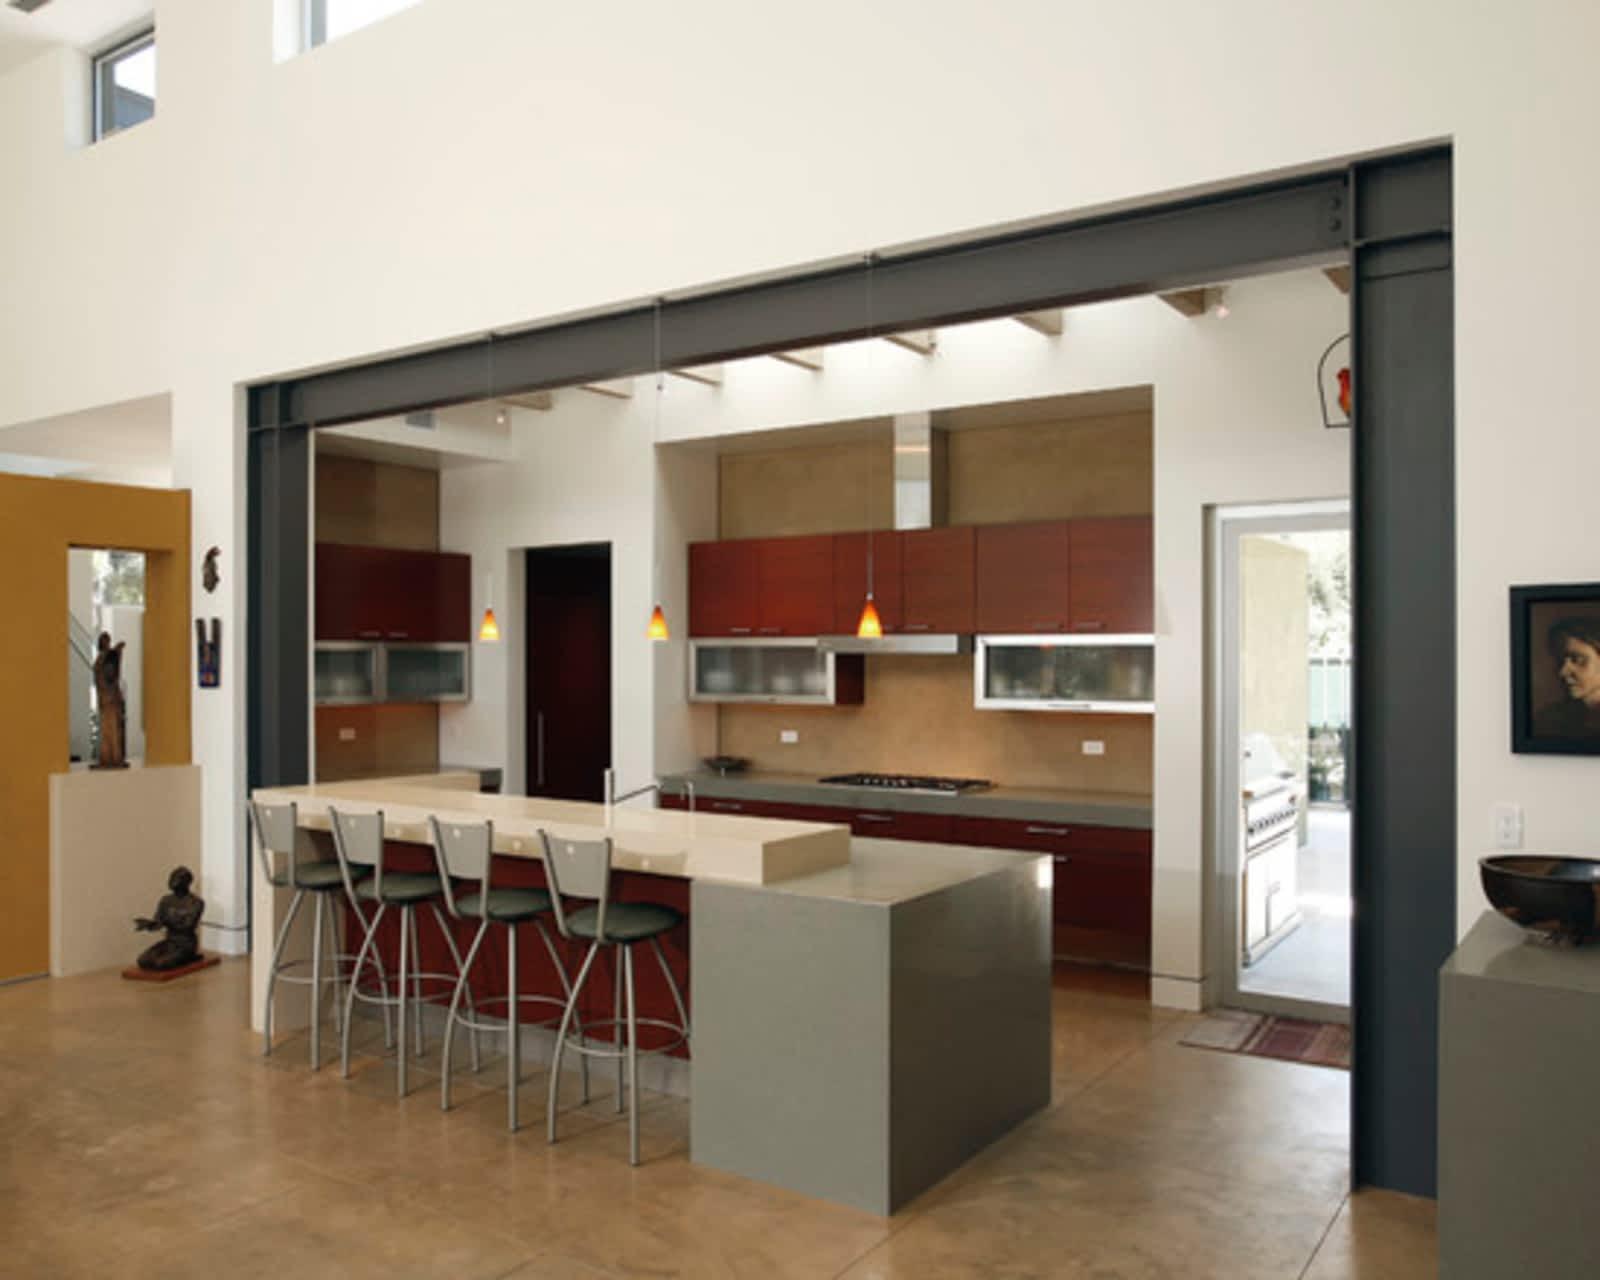 Cuisine Concept | Concept Cuisine Mg Opening Hours 10007 Rue Mirabeau Anjou Qc